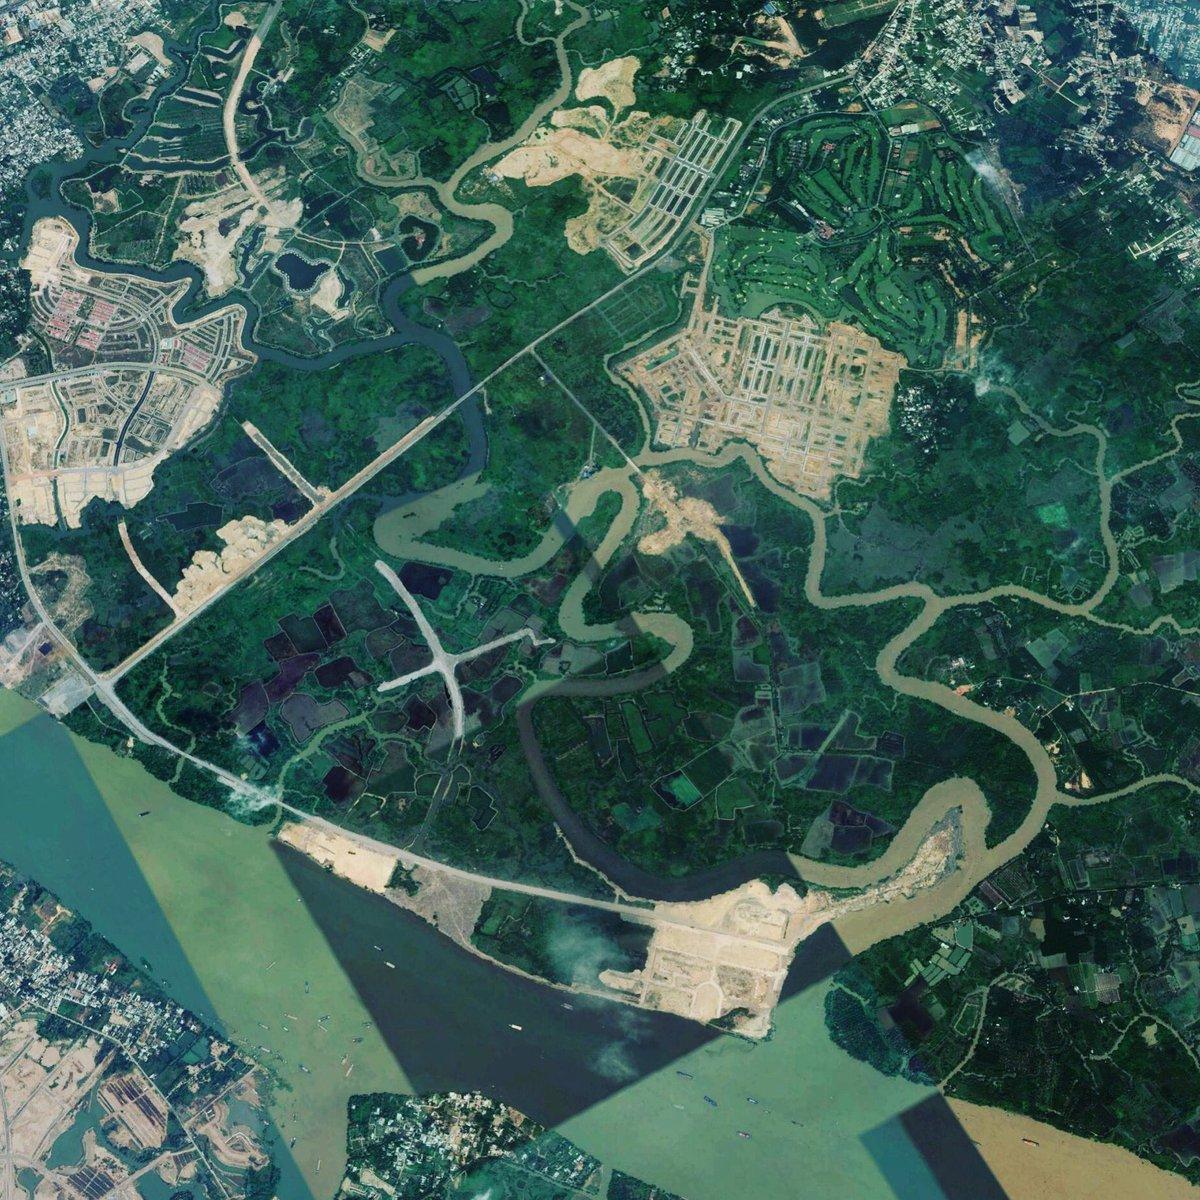 Great location #aquacity #Novaland #realestate #vietnam #riverside #investment #Propertypic.twitter.com/y8W3kCFZgC